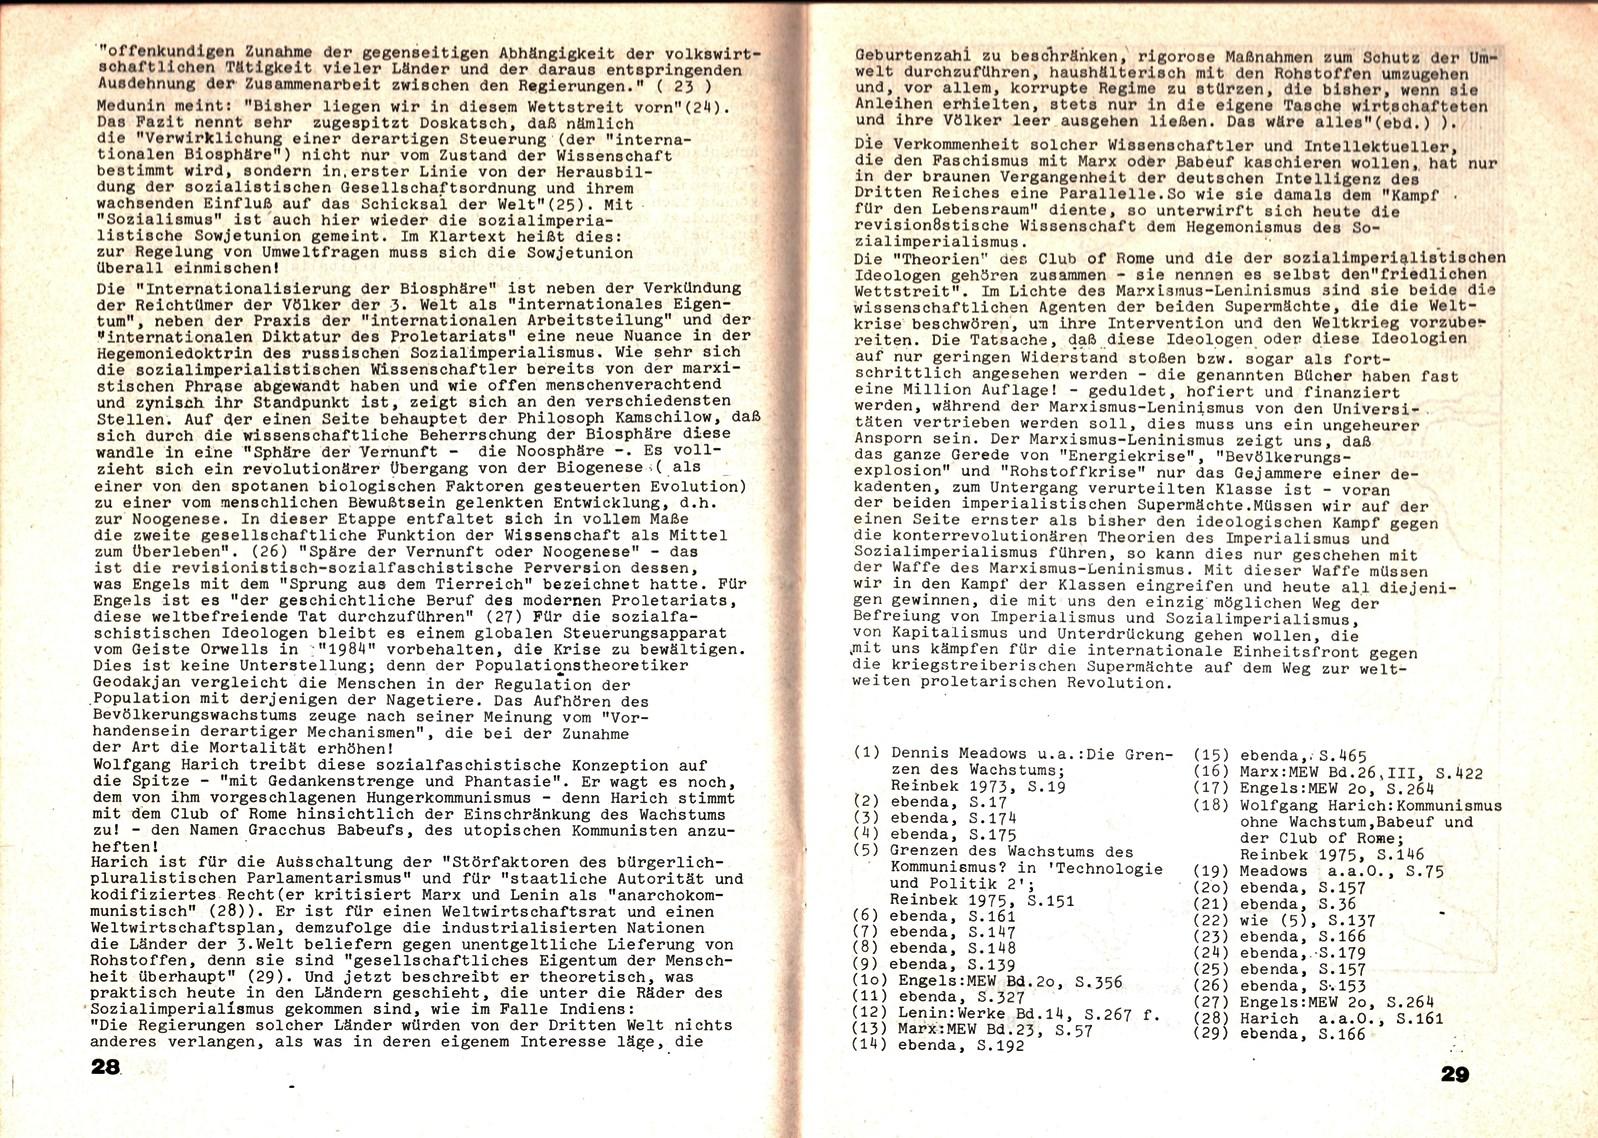 KSV_1976_Atomenergie_im_Kapitalismus_016